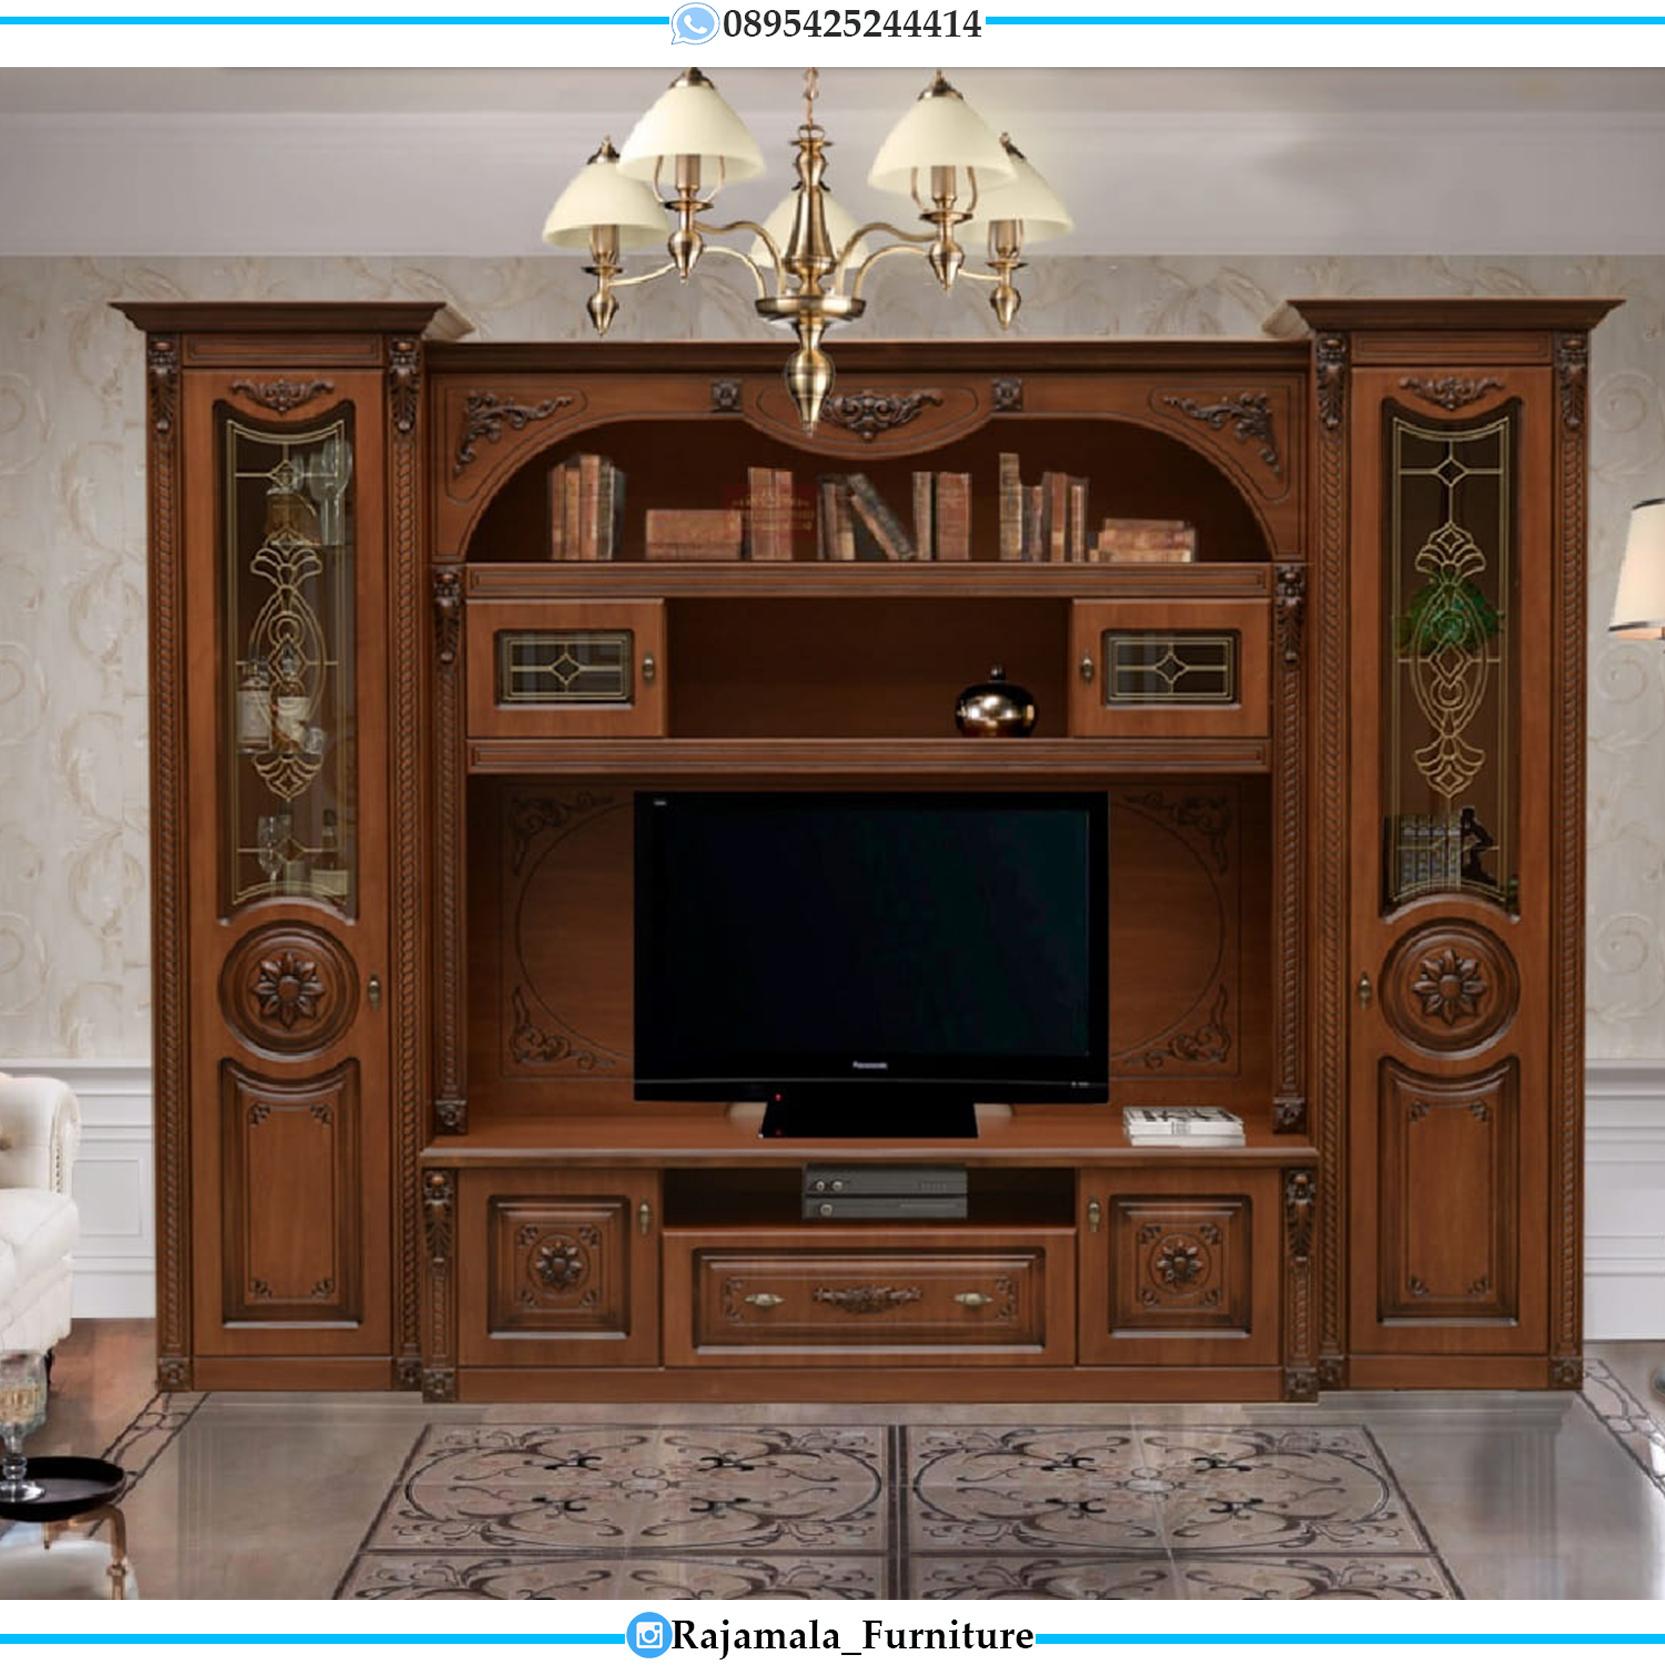 Desain Bufet TV Mewah Luxury Classic Jepara RM-0098